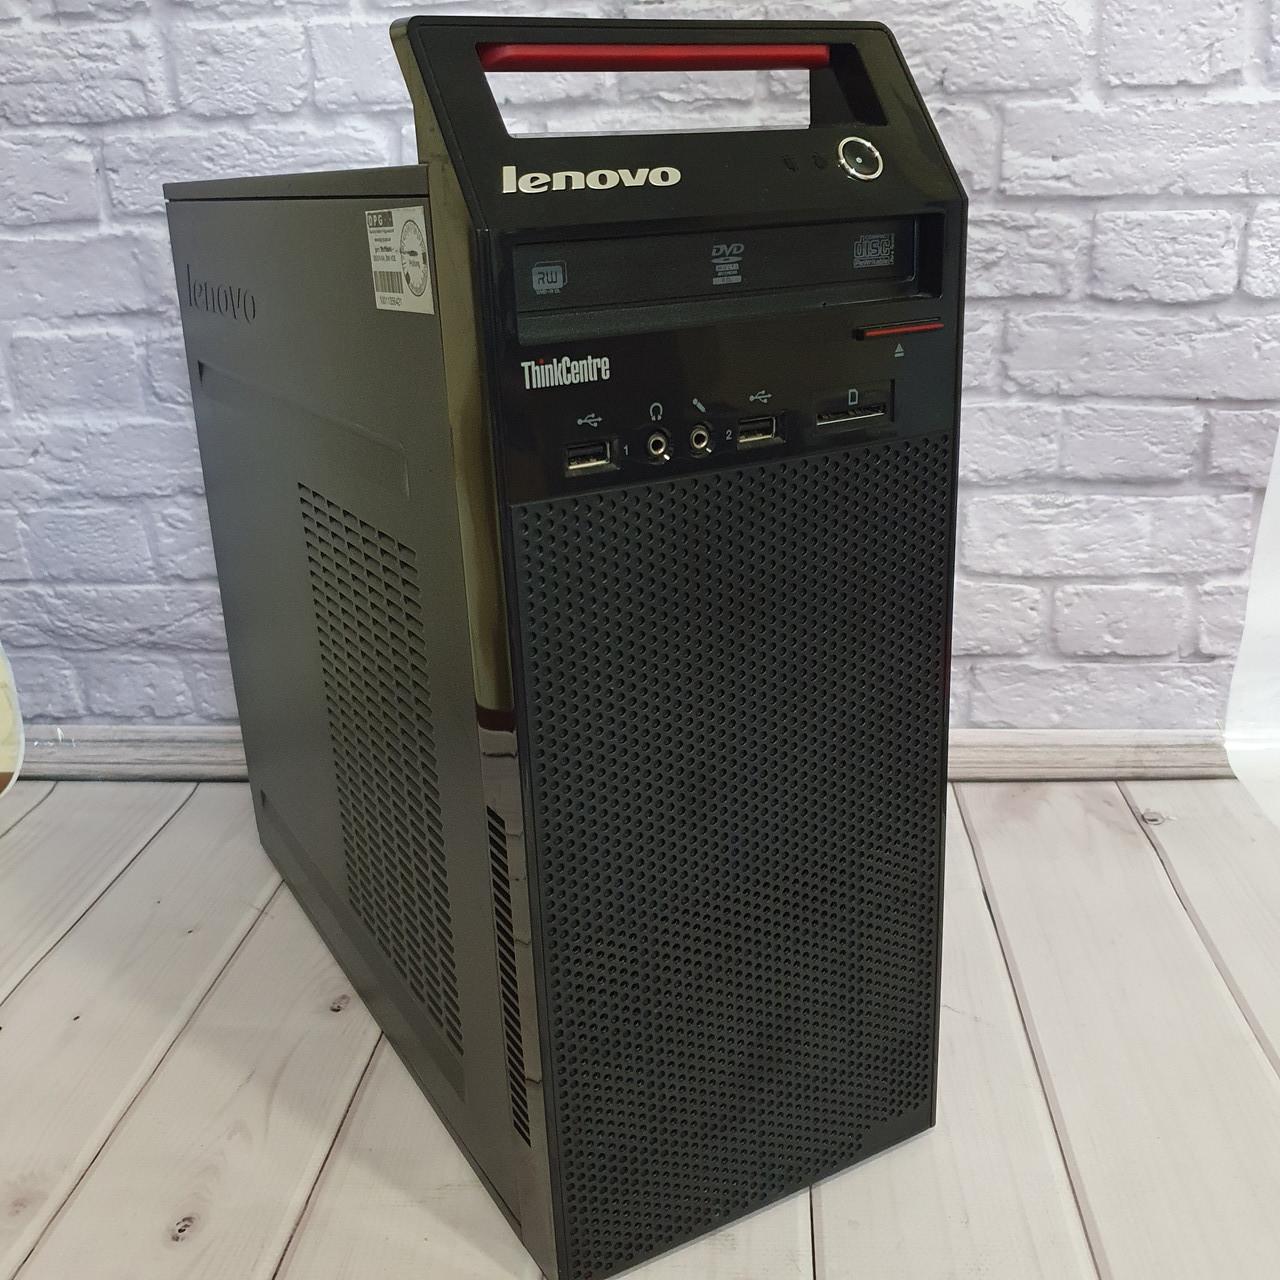 Системний блок Lenovo MT (Intel Core i3-4130 4x3.40 Ghz/4 Gb DDR3/HDD 250 Gb/DVD)